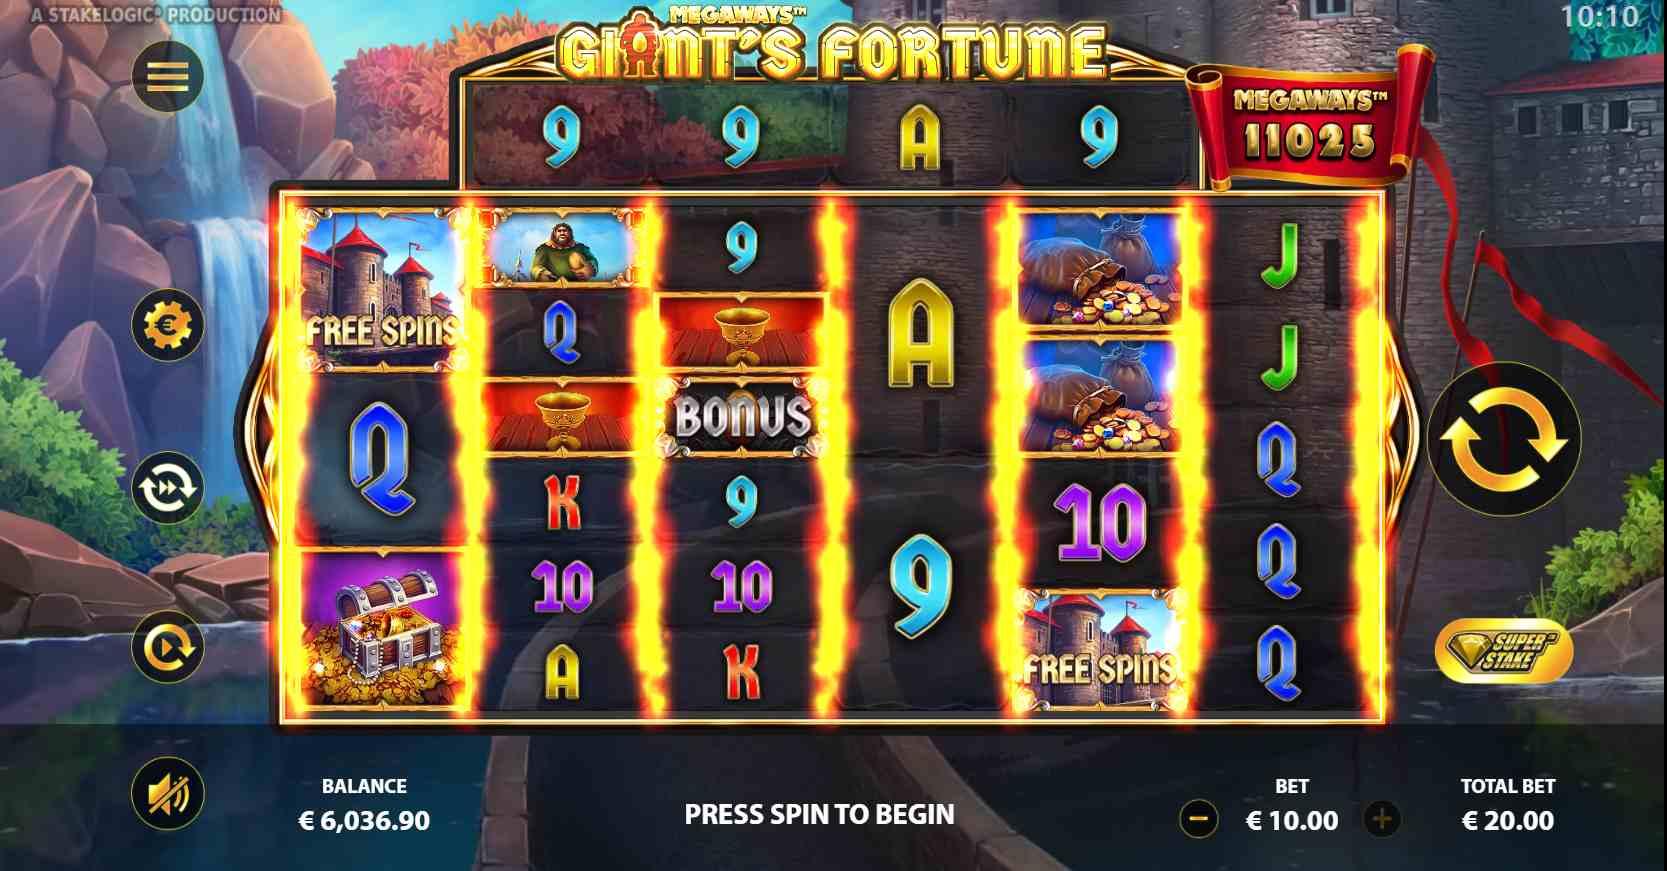 Giant's Fortune Megaways Slot Base Game